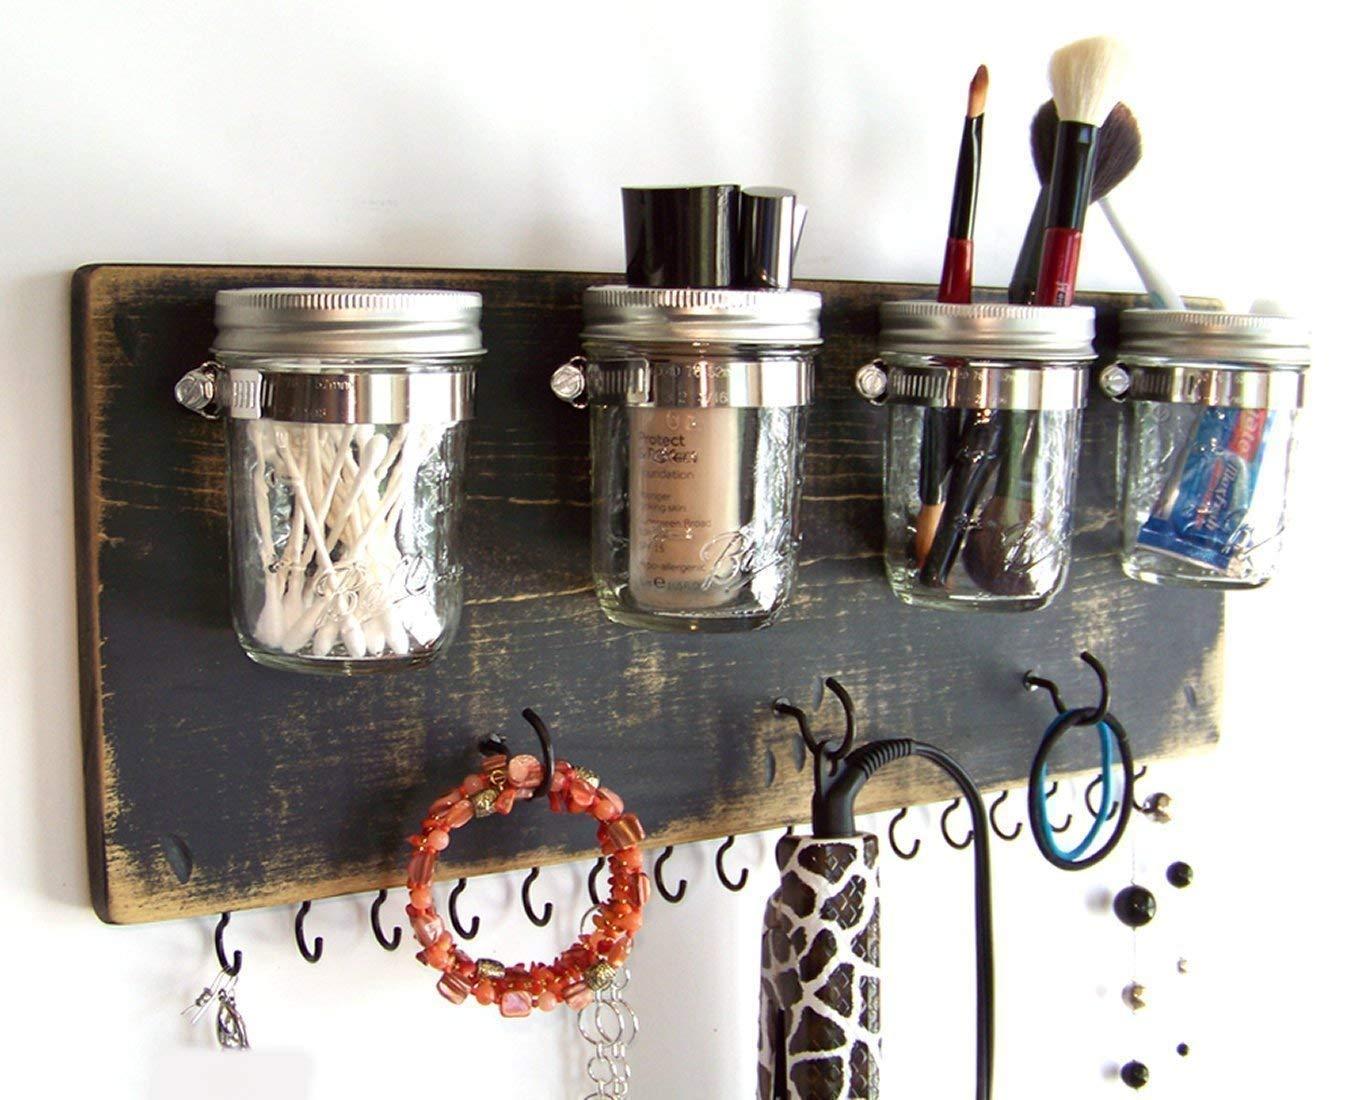 Farmhouse Decor Bathroom Storage by Out Back Craft Shack: Hair Accessory Organizer with Mason Jars